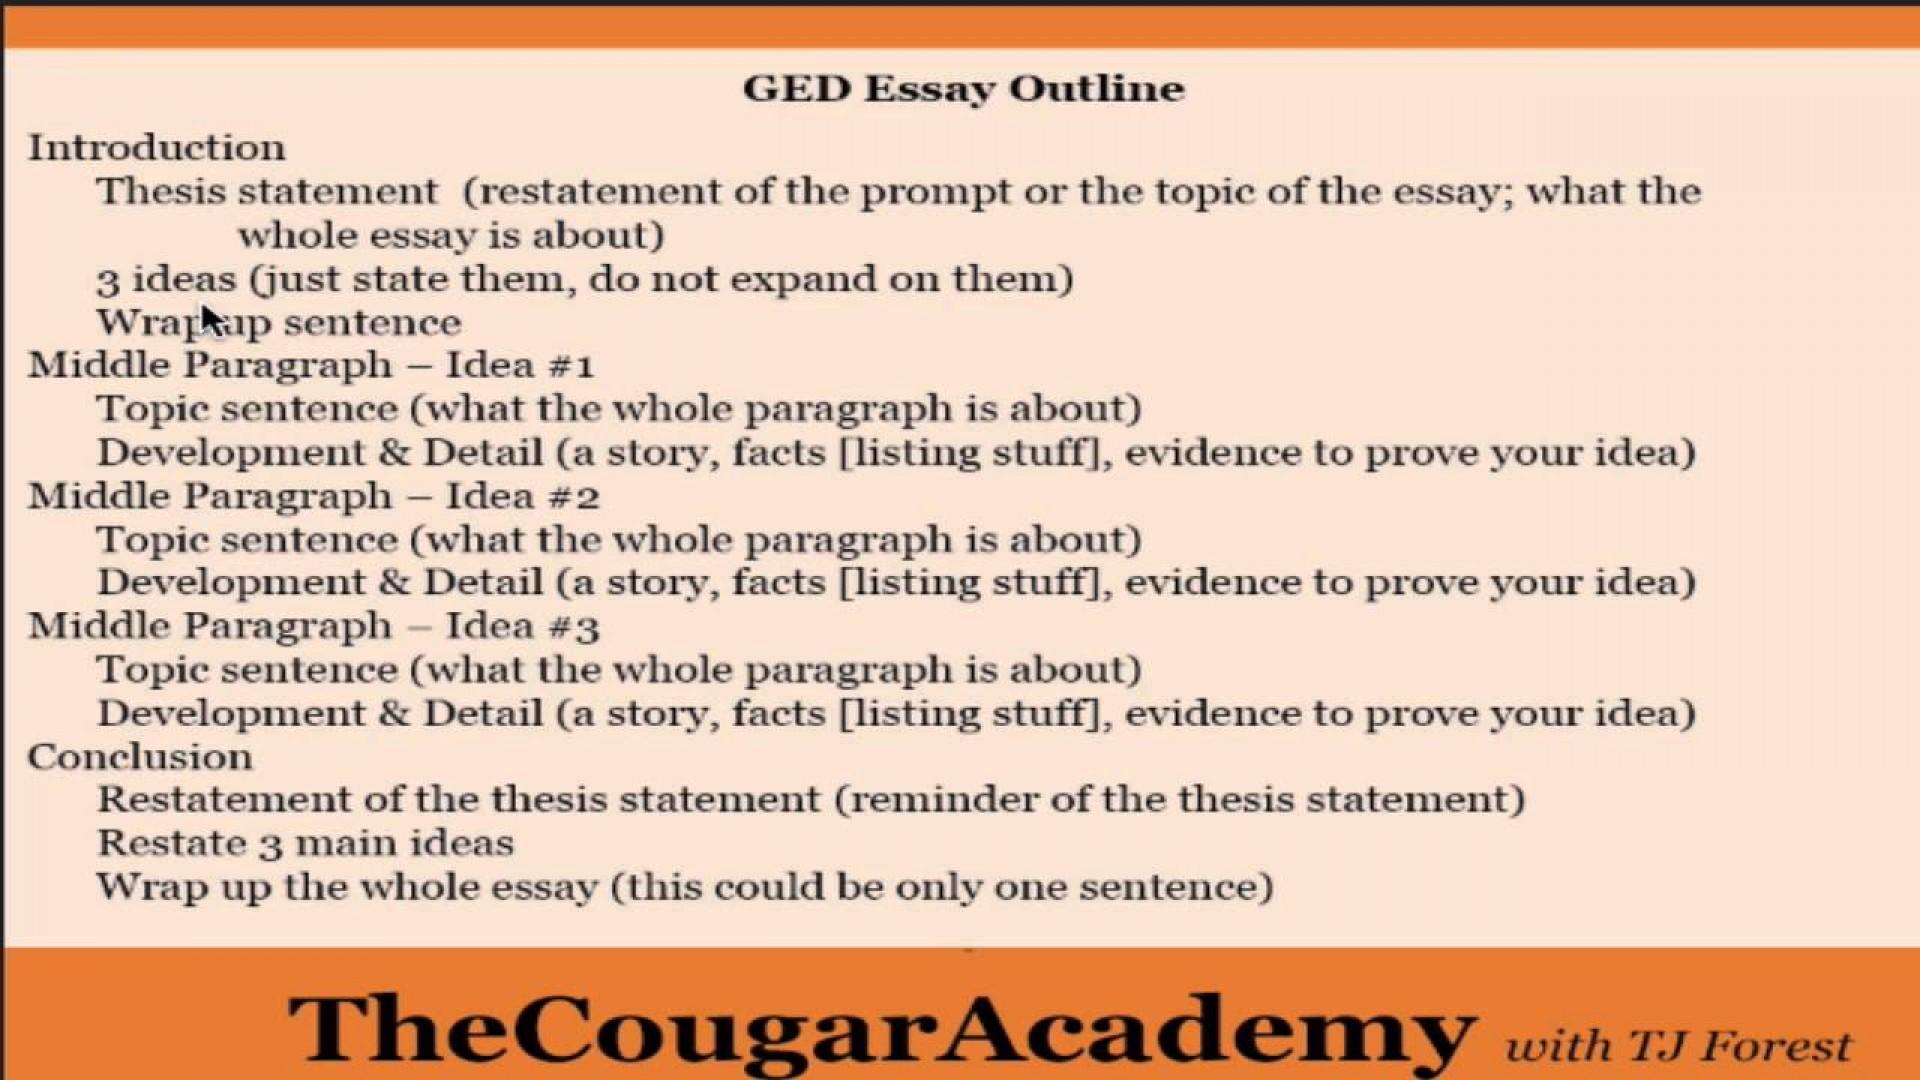 Essay on short story everyday use